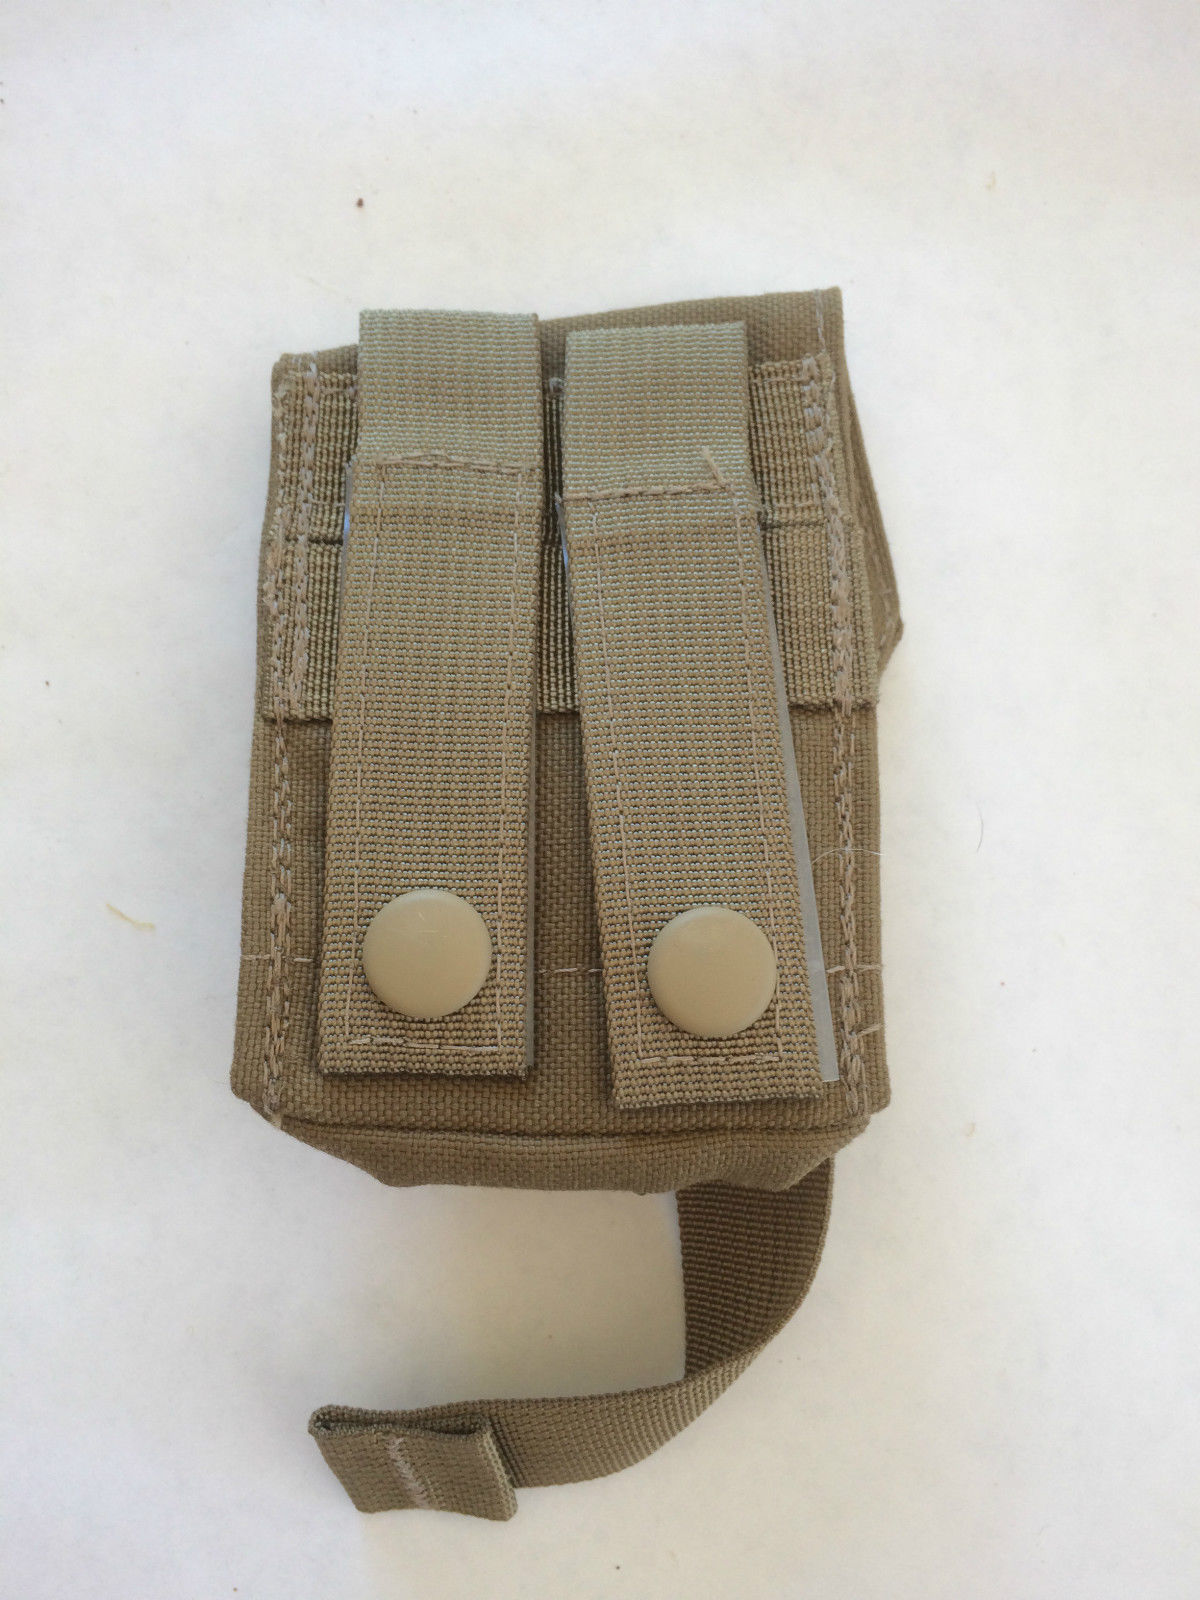 Coyote Brown London Bridge LBT-9008A Single Frag Grenade MOLLE Pouch